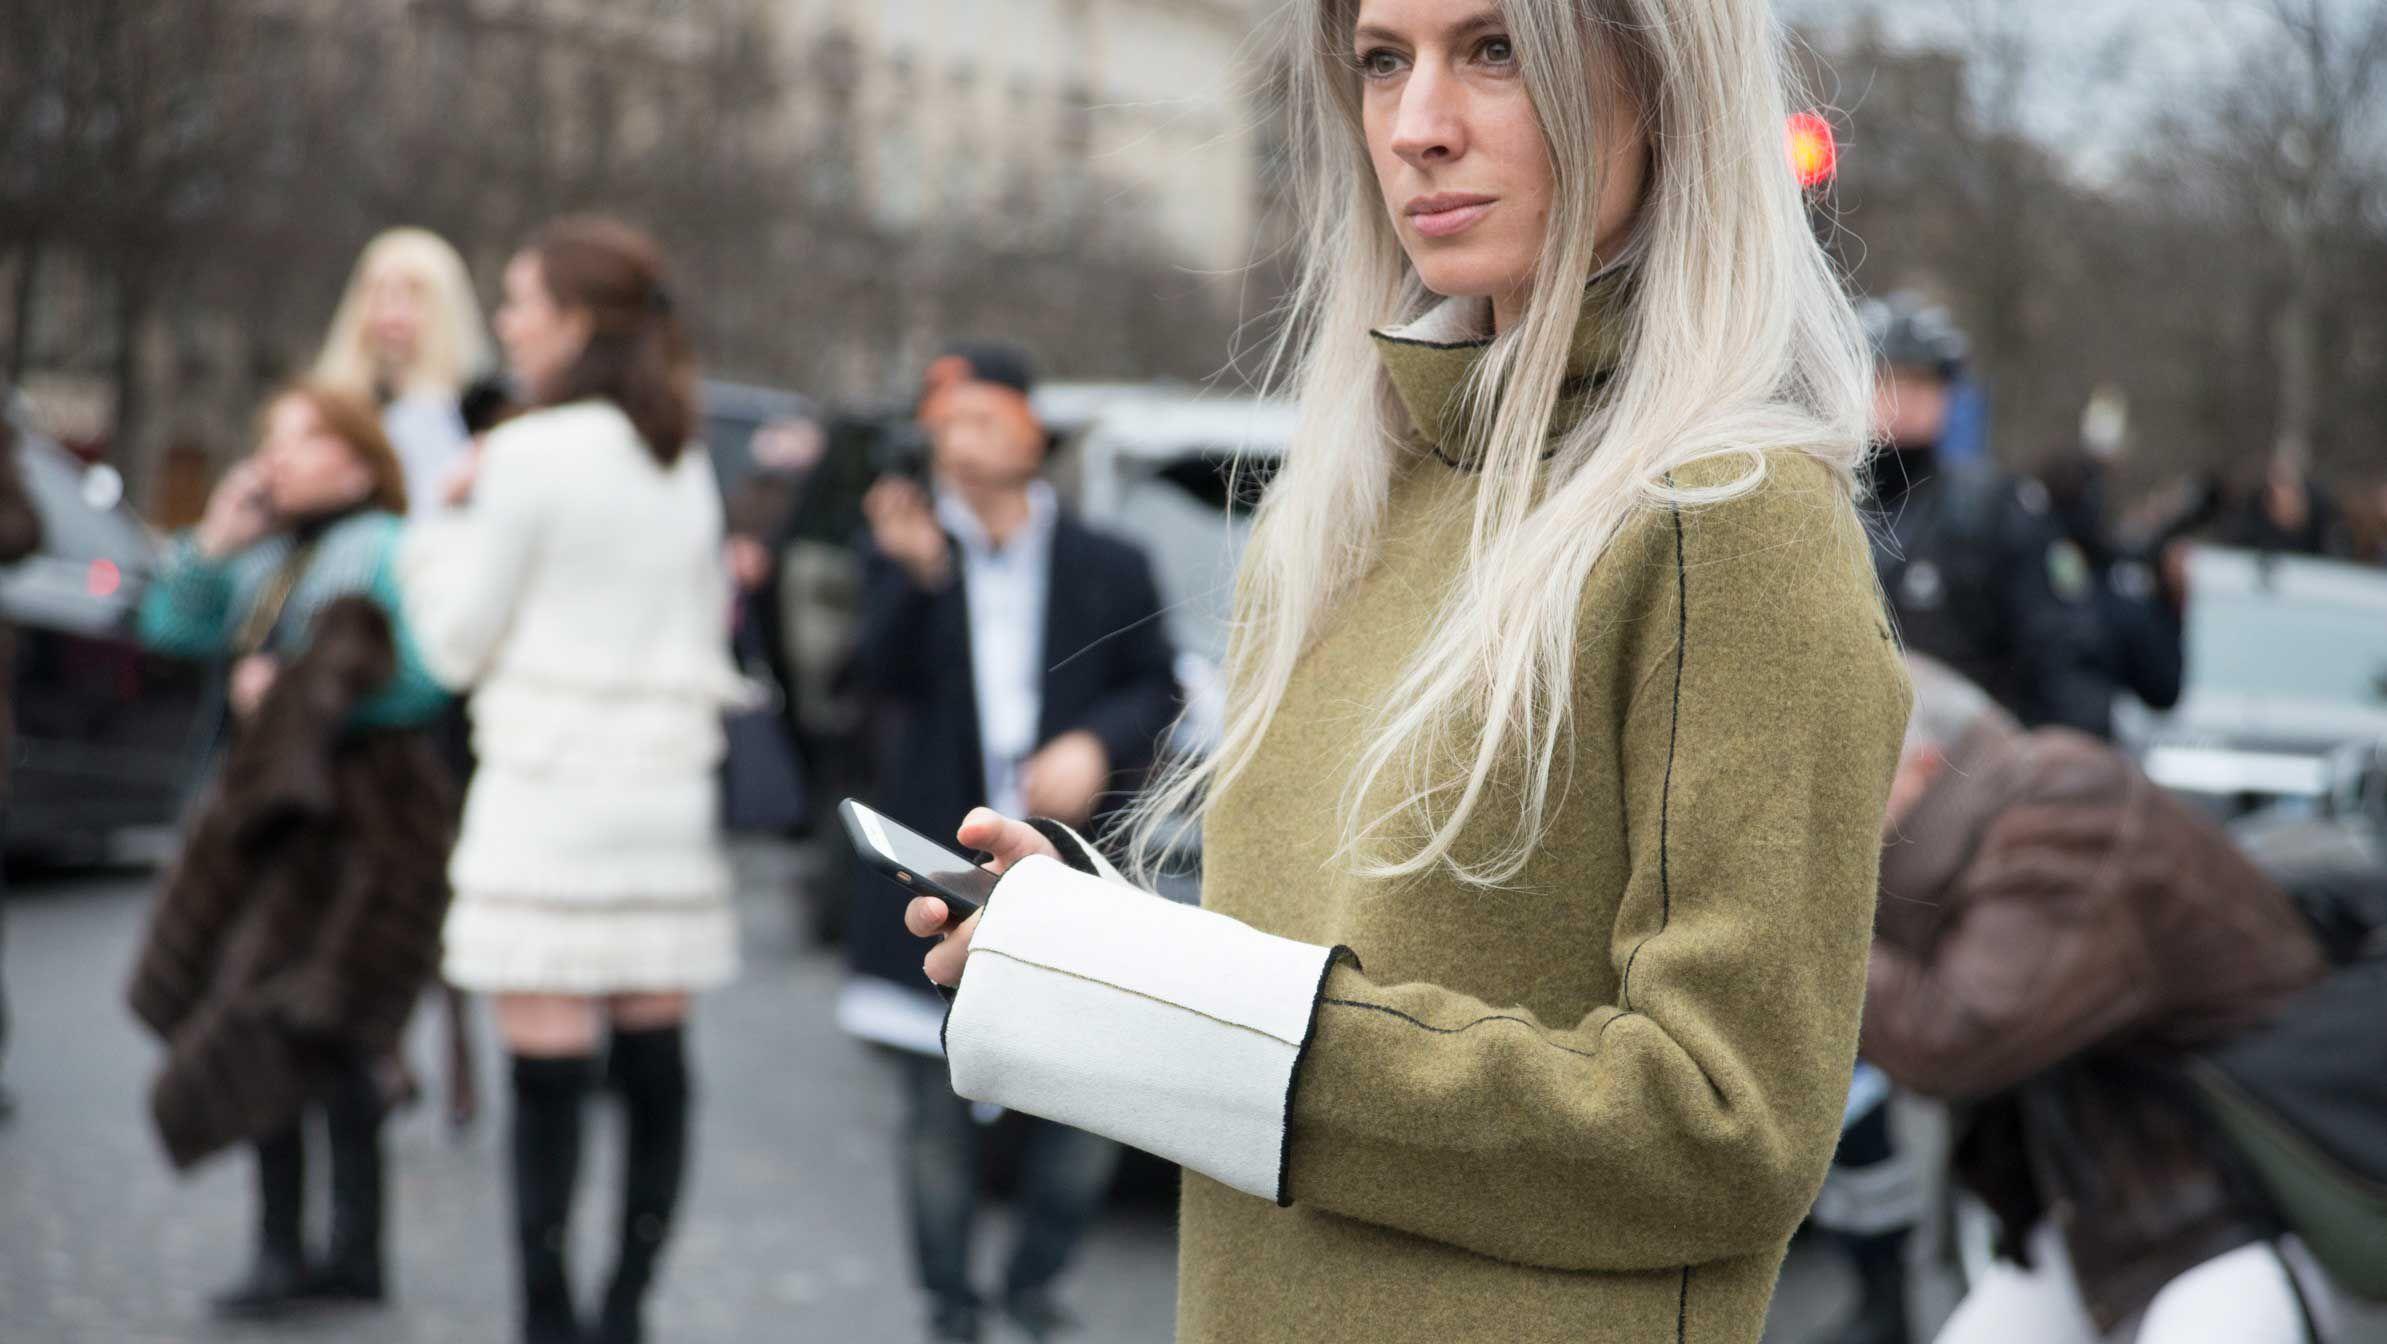 Science identifies genes responsible for grey hair and monobrows